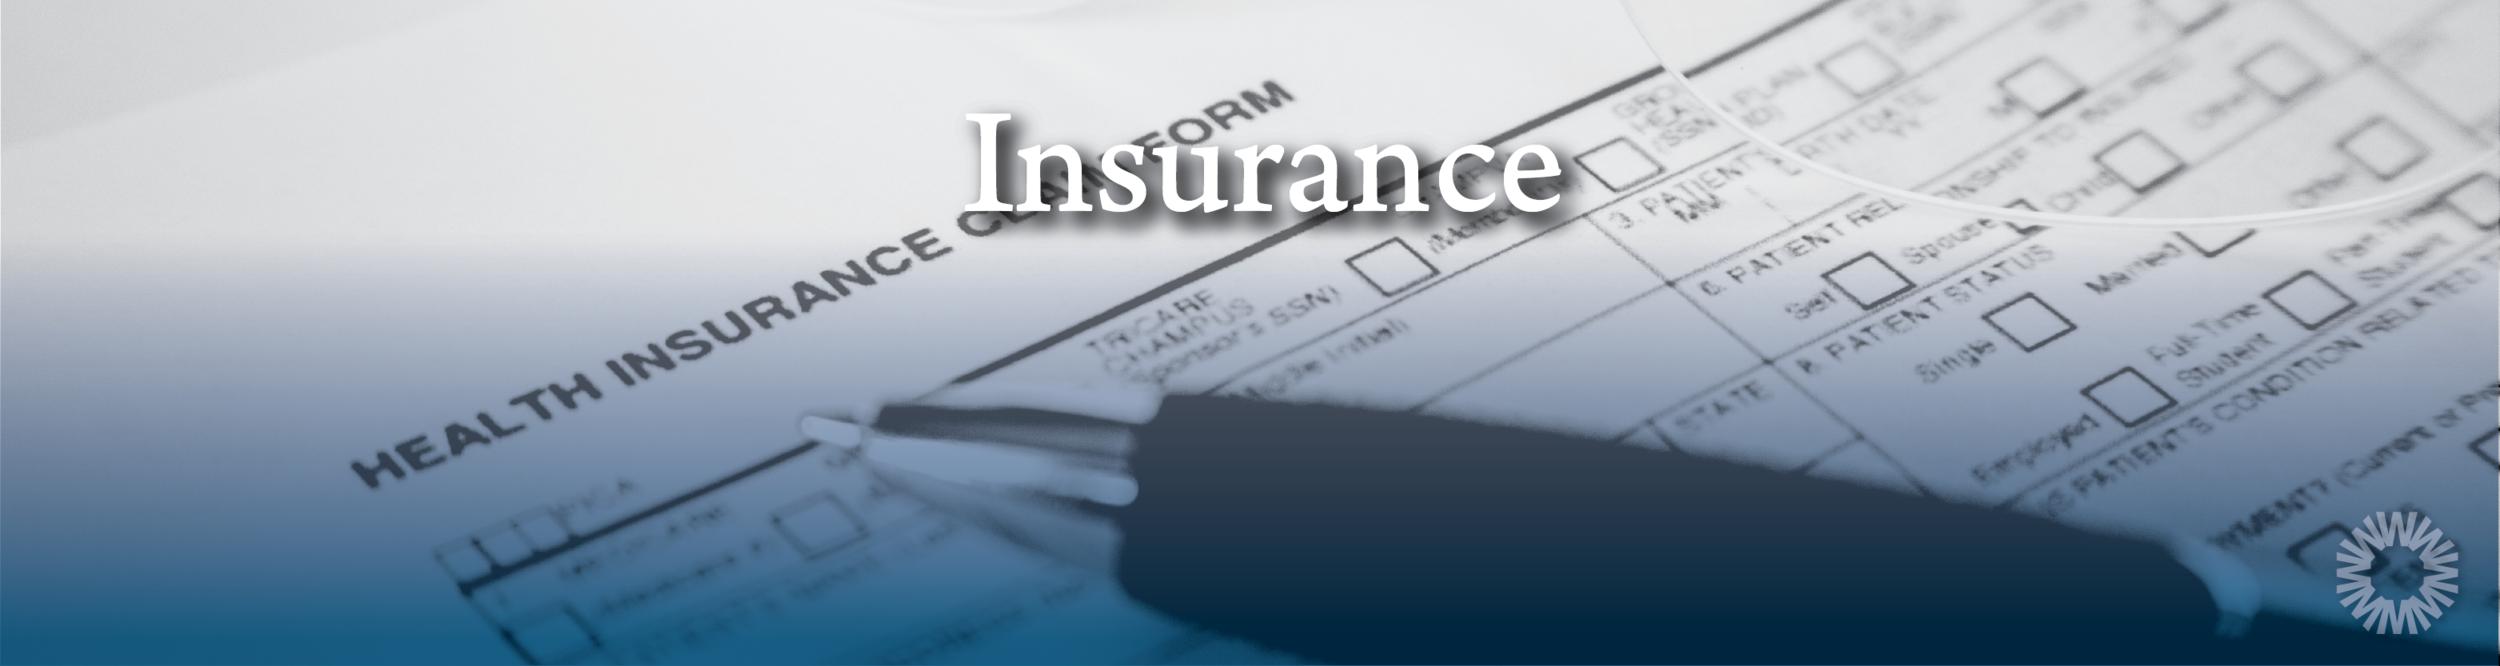 insurance-header.png